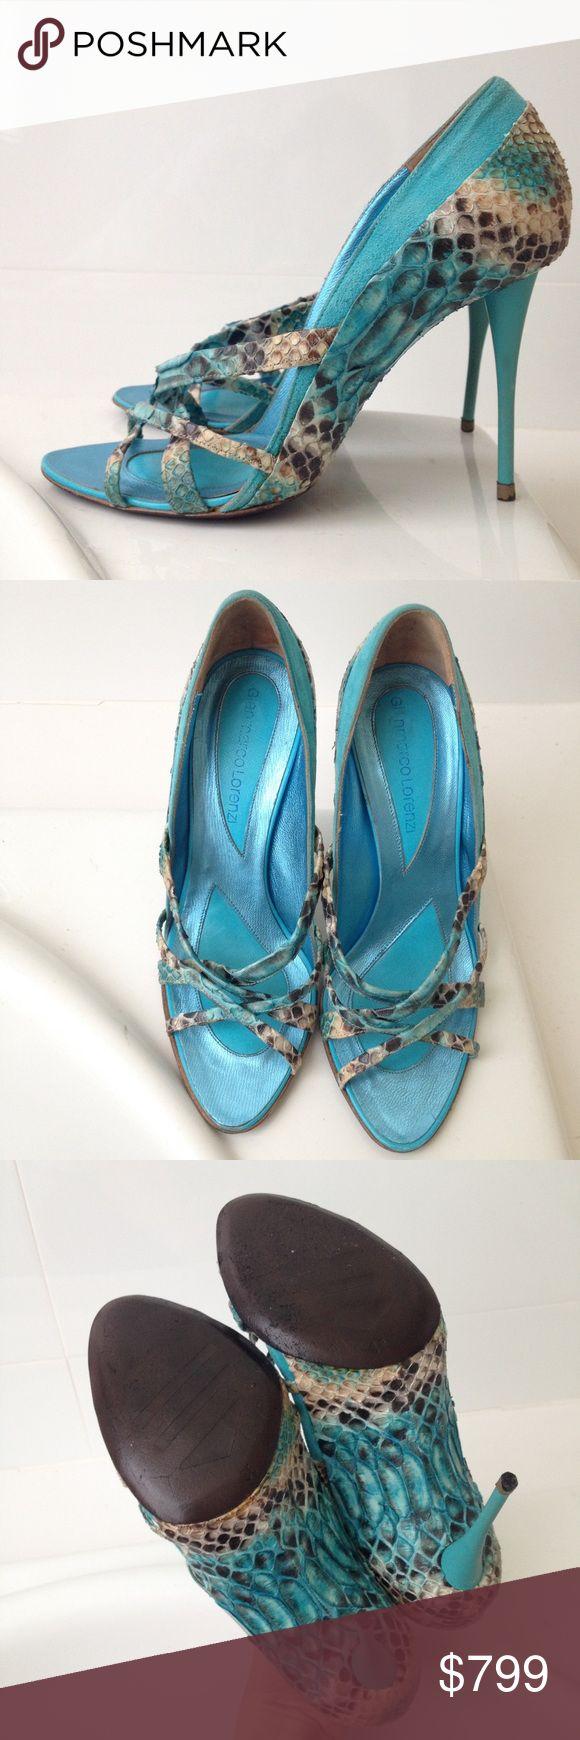 ⚜Gianmarco Lorenzi Python Turquoise Heels Brand new. Retail $1299 Size 36 Includes Original Box. Gianmarco Lorenzi Shoes Heels